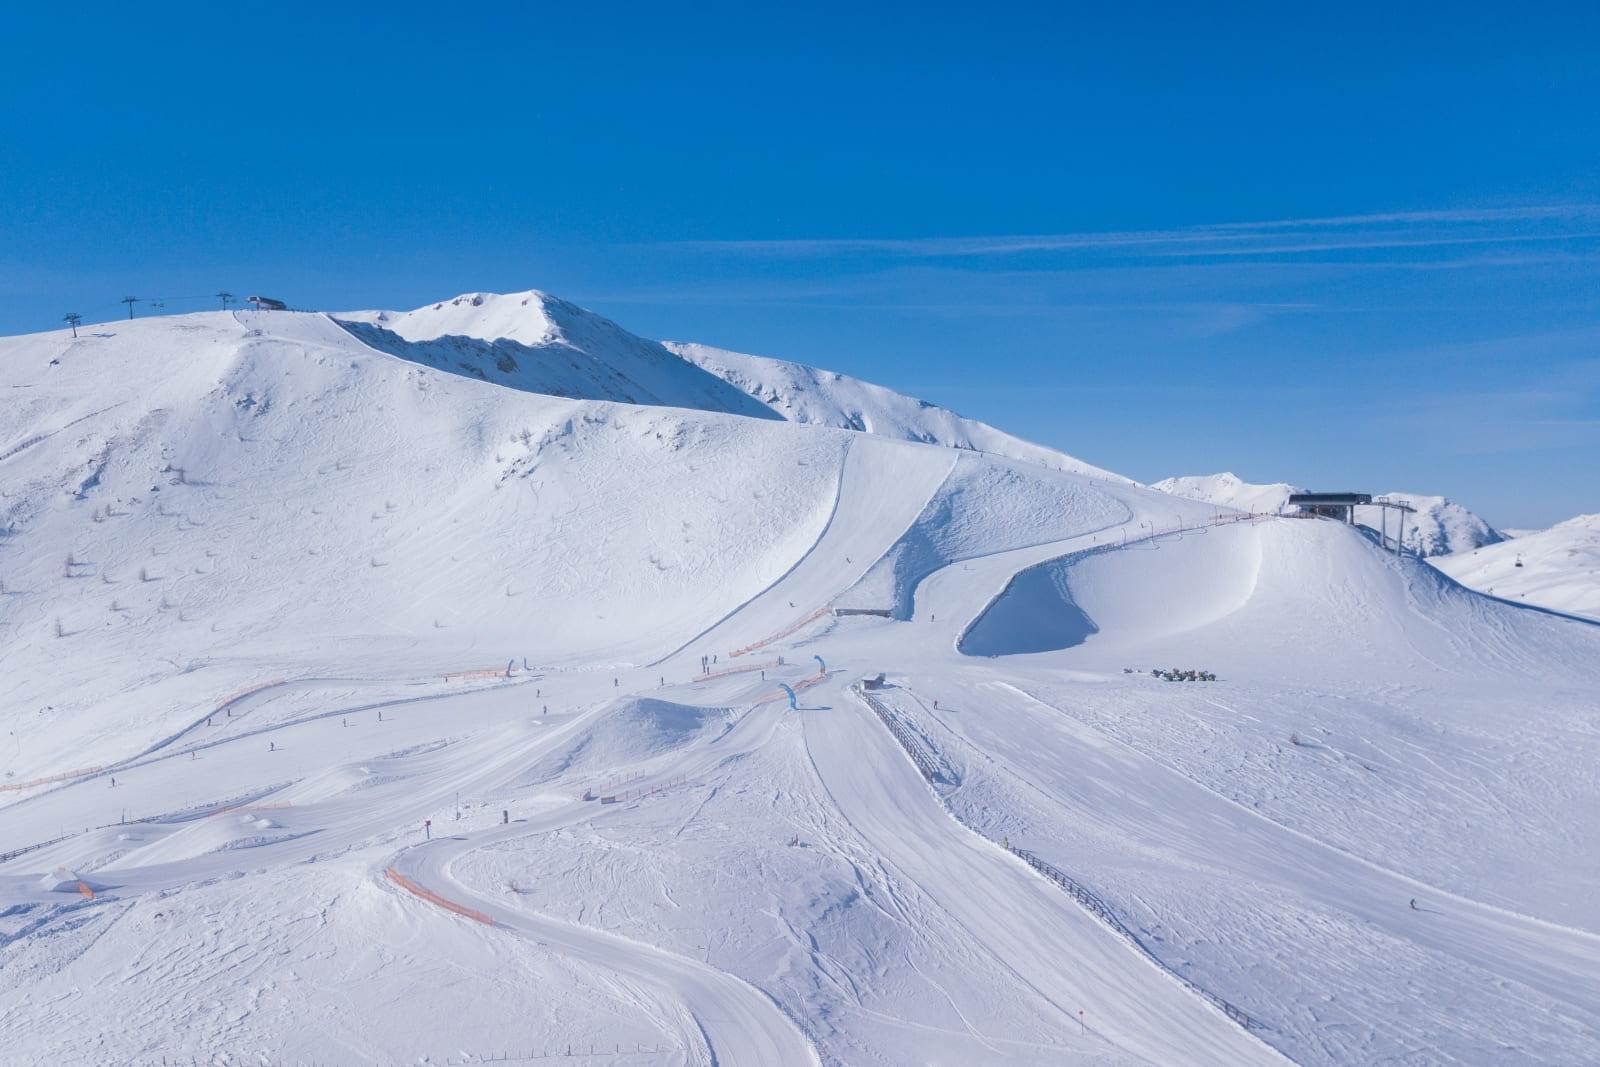 Heidi-Chalets-Turracher-Hoehe-Piste-Panorama